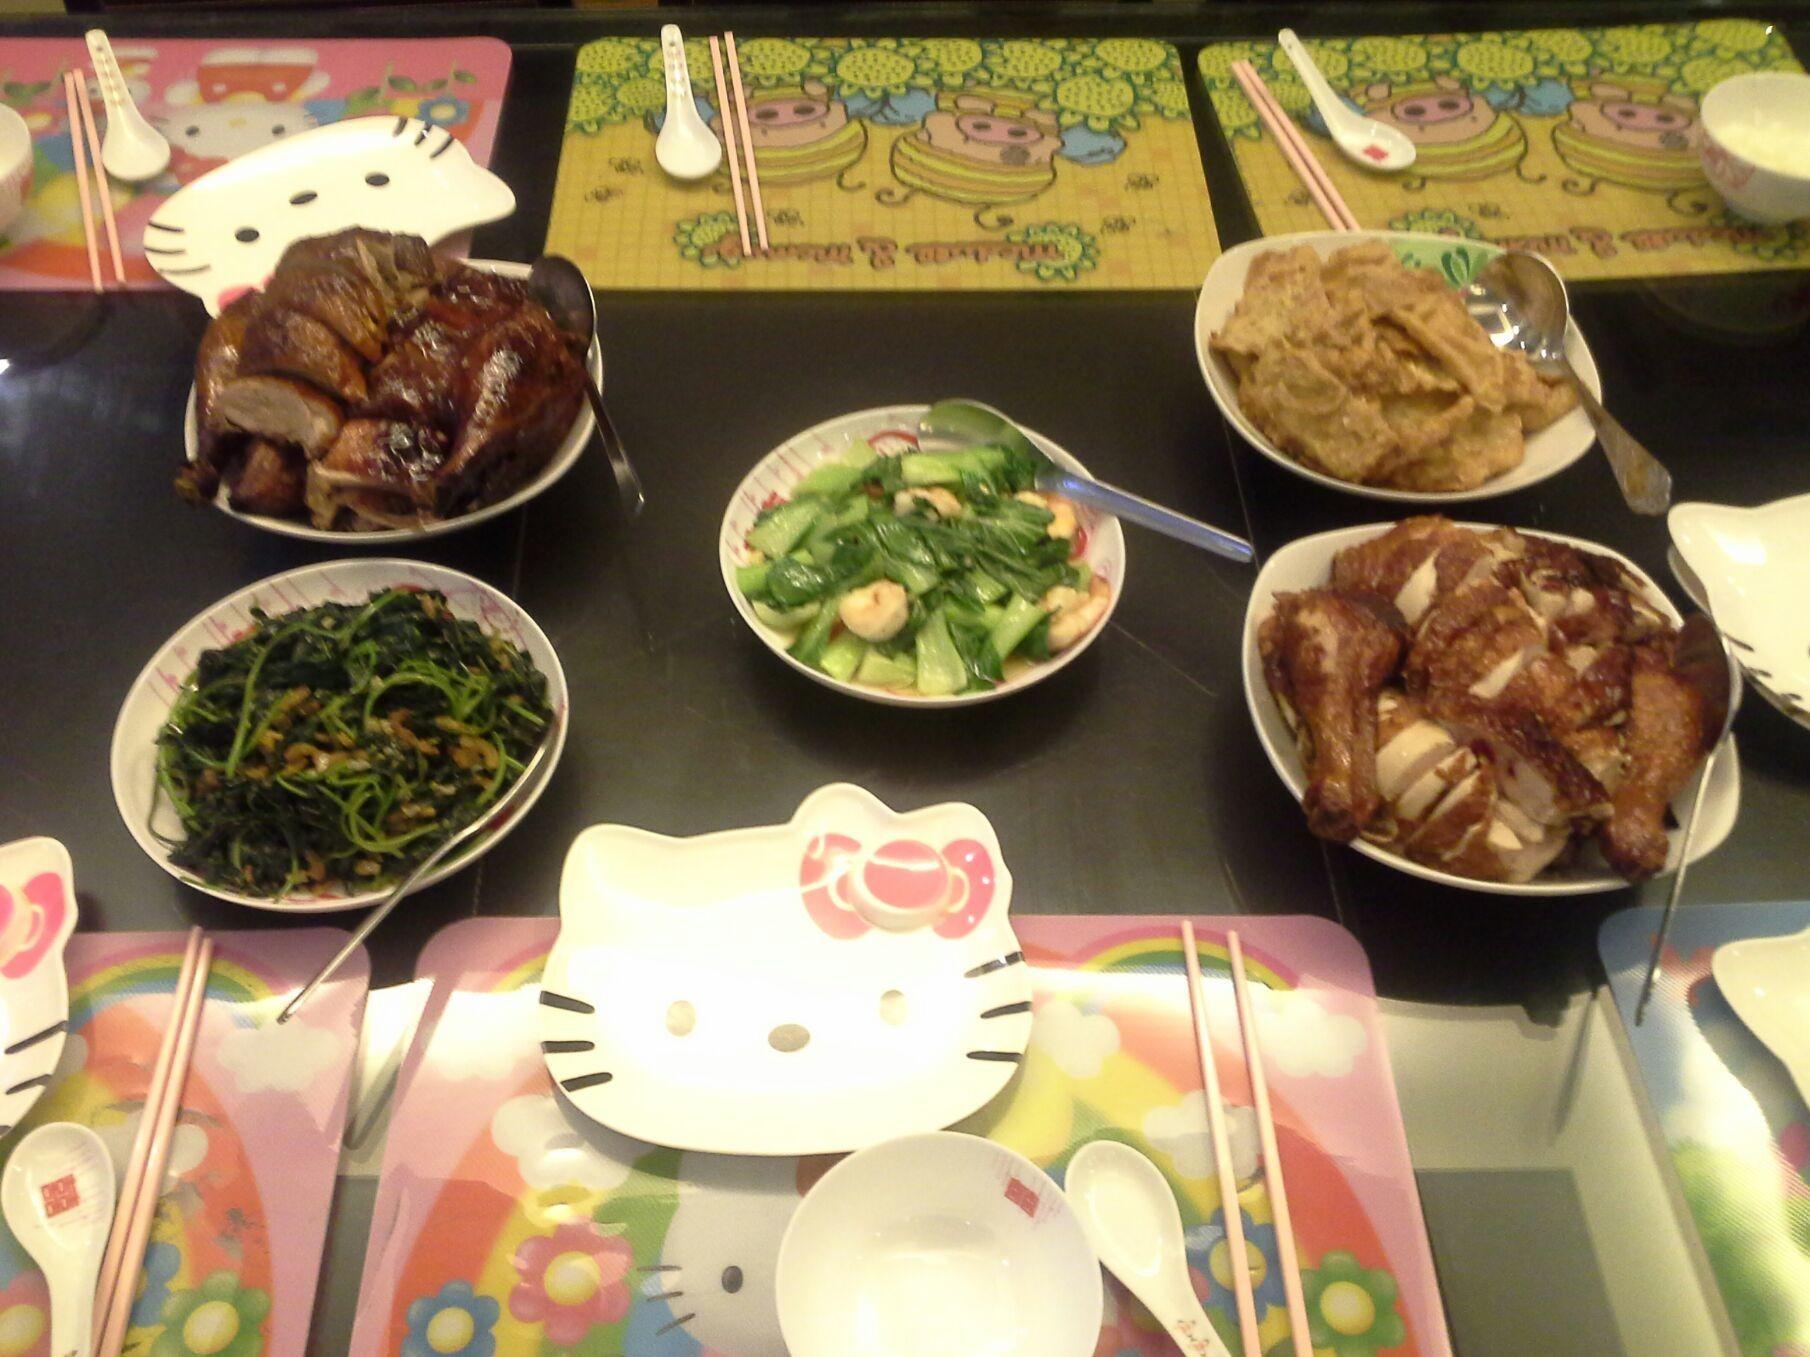 端午節晚餐 Happy Dumpling Day ^^